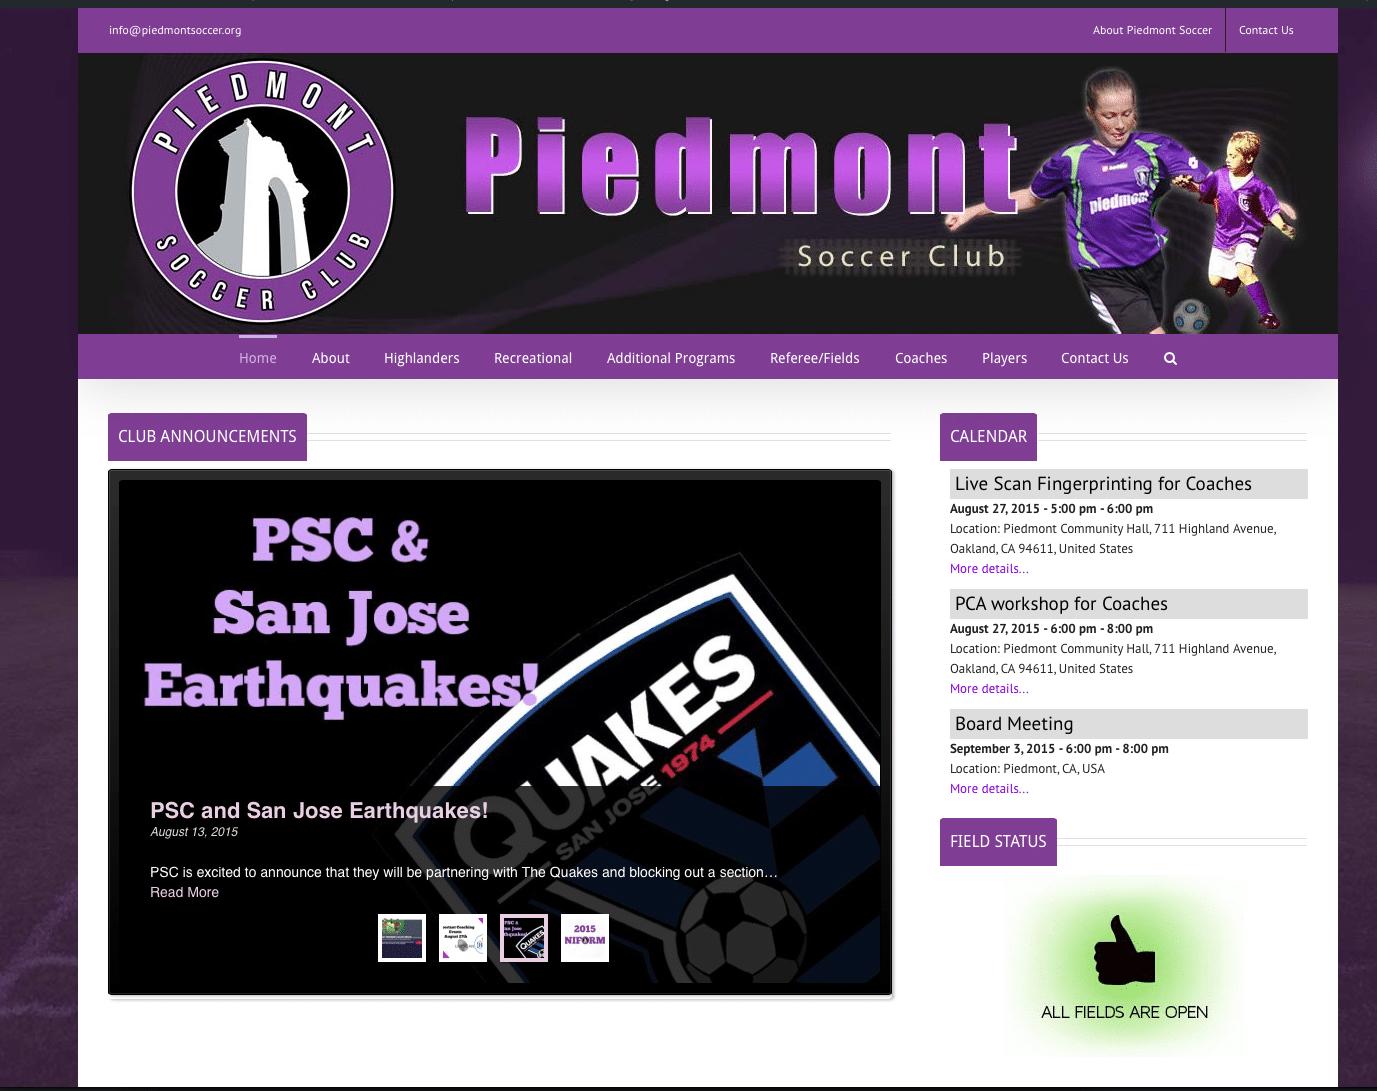 Piedmont Soccer Club